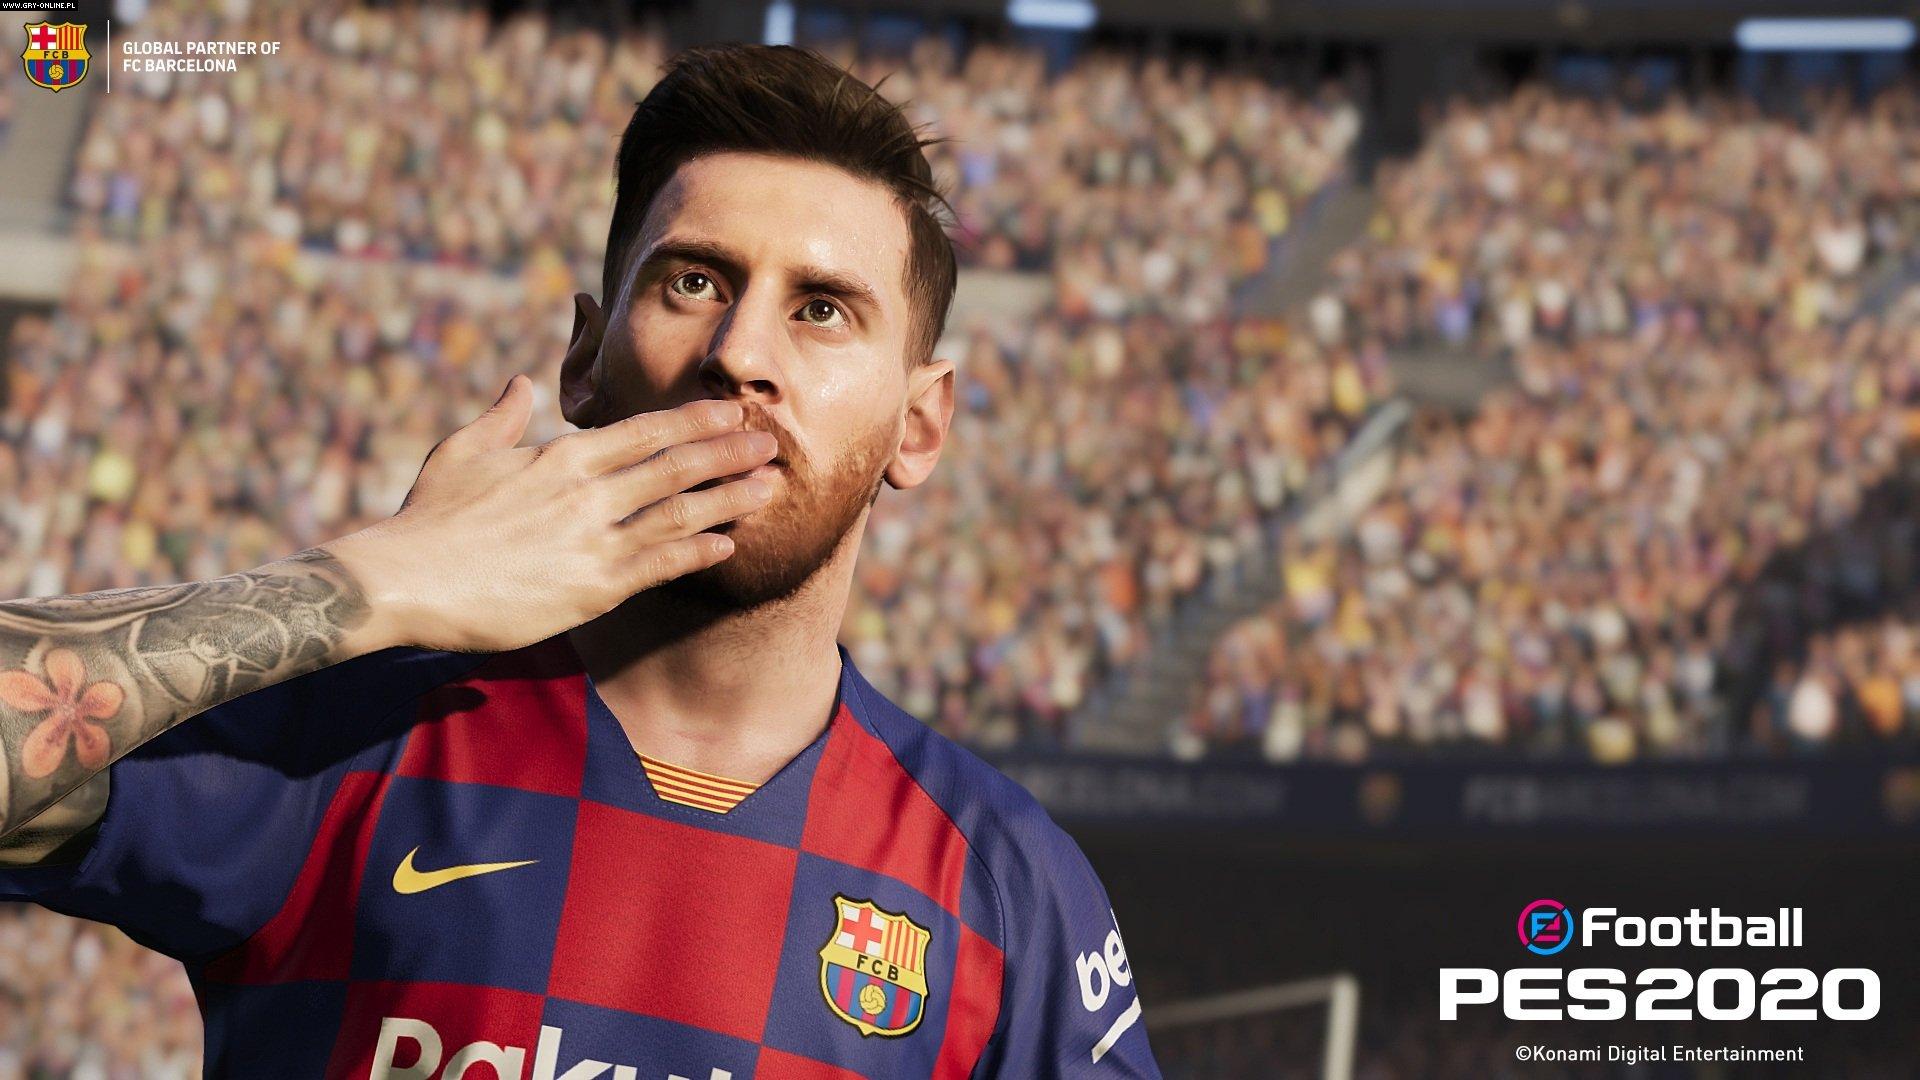 eFootball PES 2020 PC, PS4, XONE Games Image 3/25, Konami